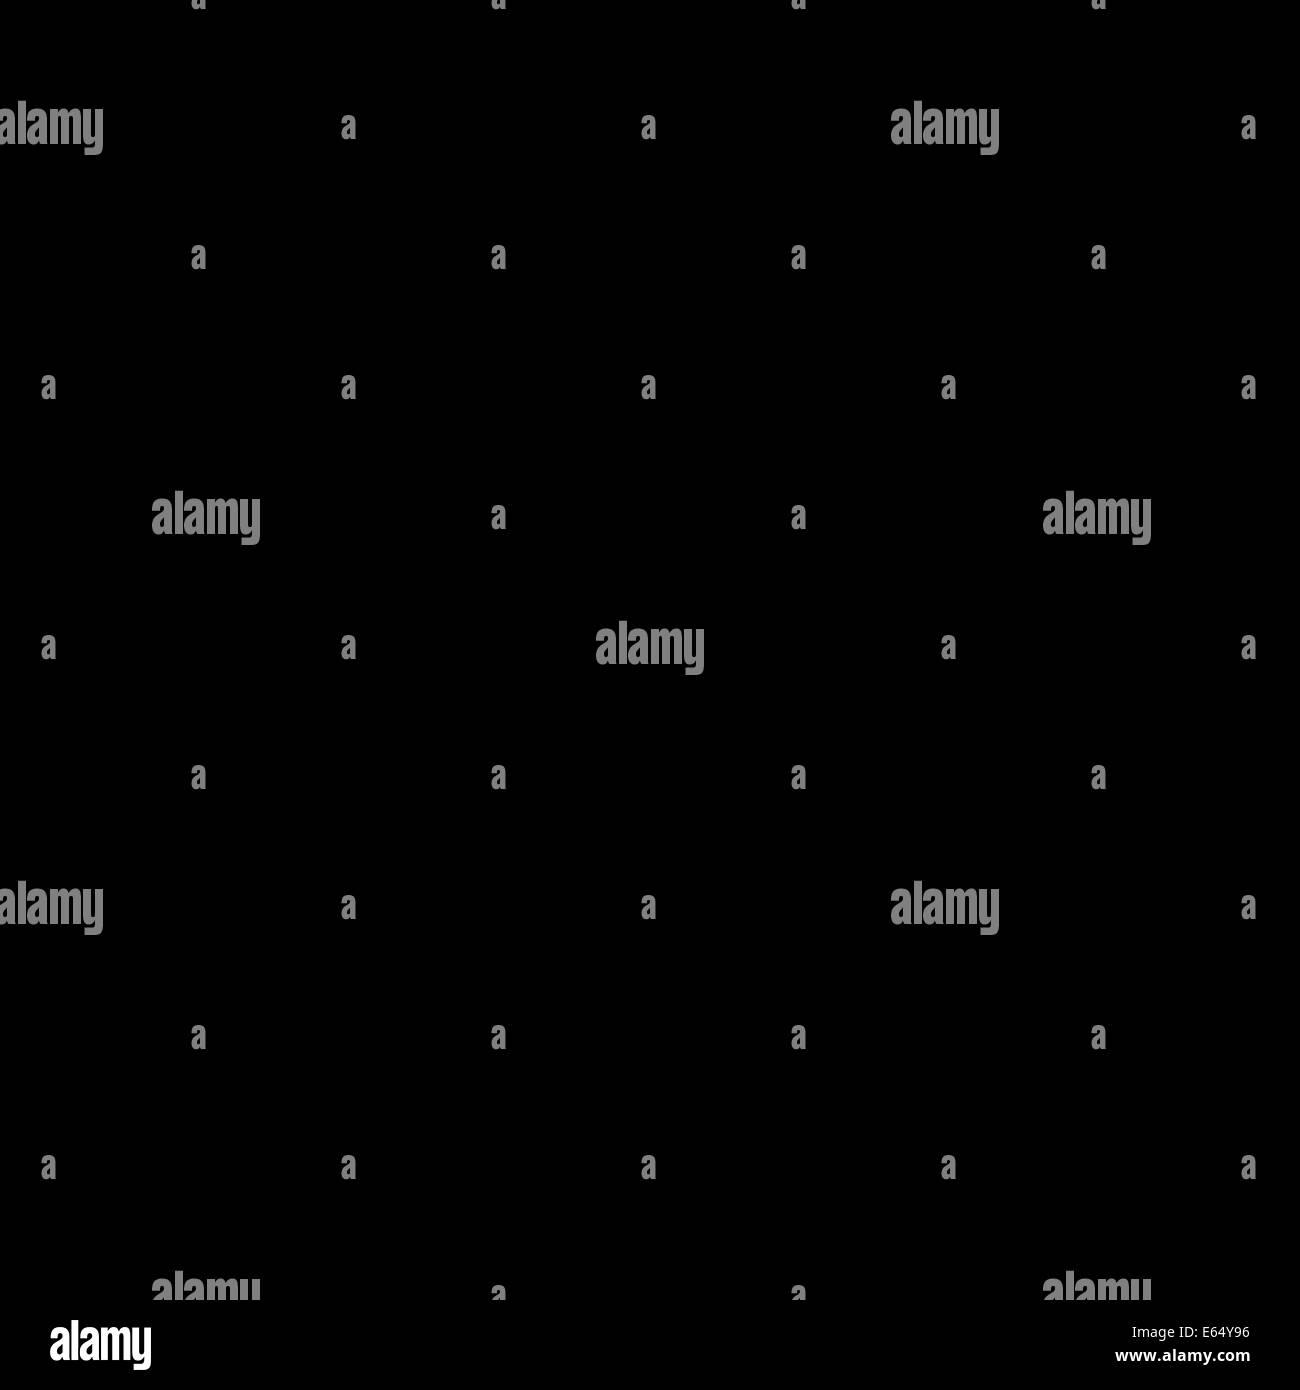 Kariert aufbringen Hahnentritt Fläche Flächig Rapport Schwarz Weiß Muster Abstrakt Kunst Artwort Stockbild